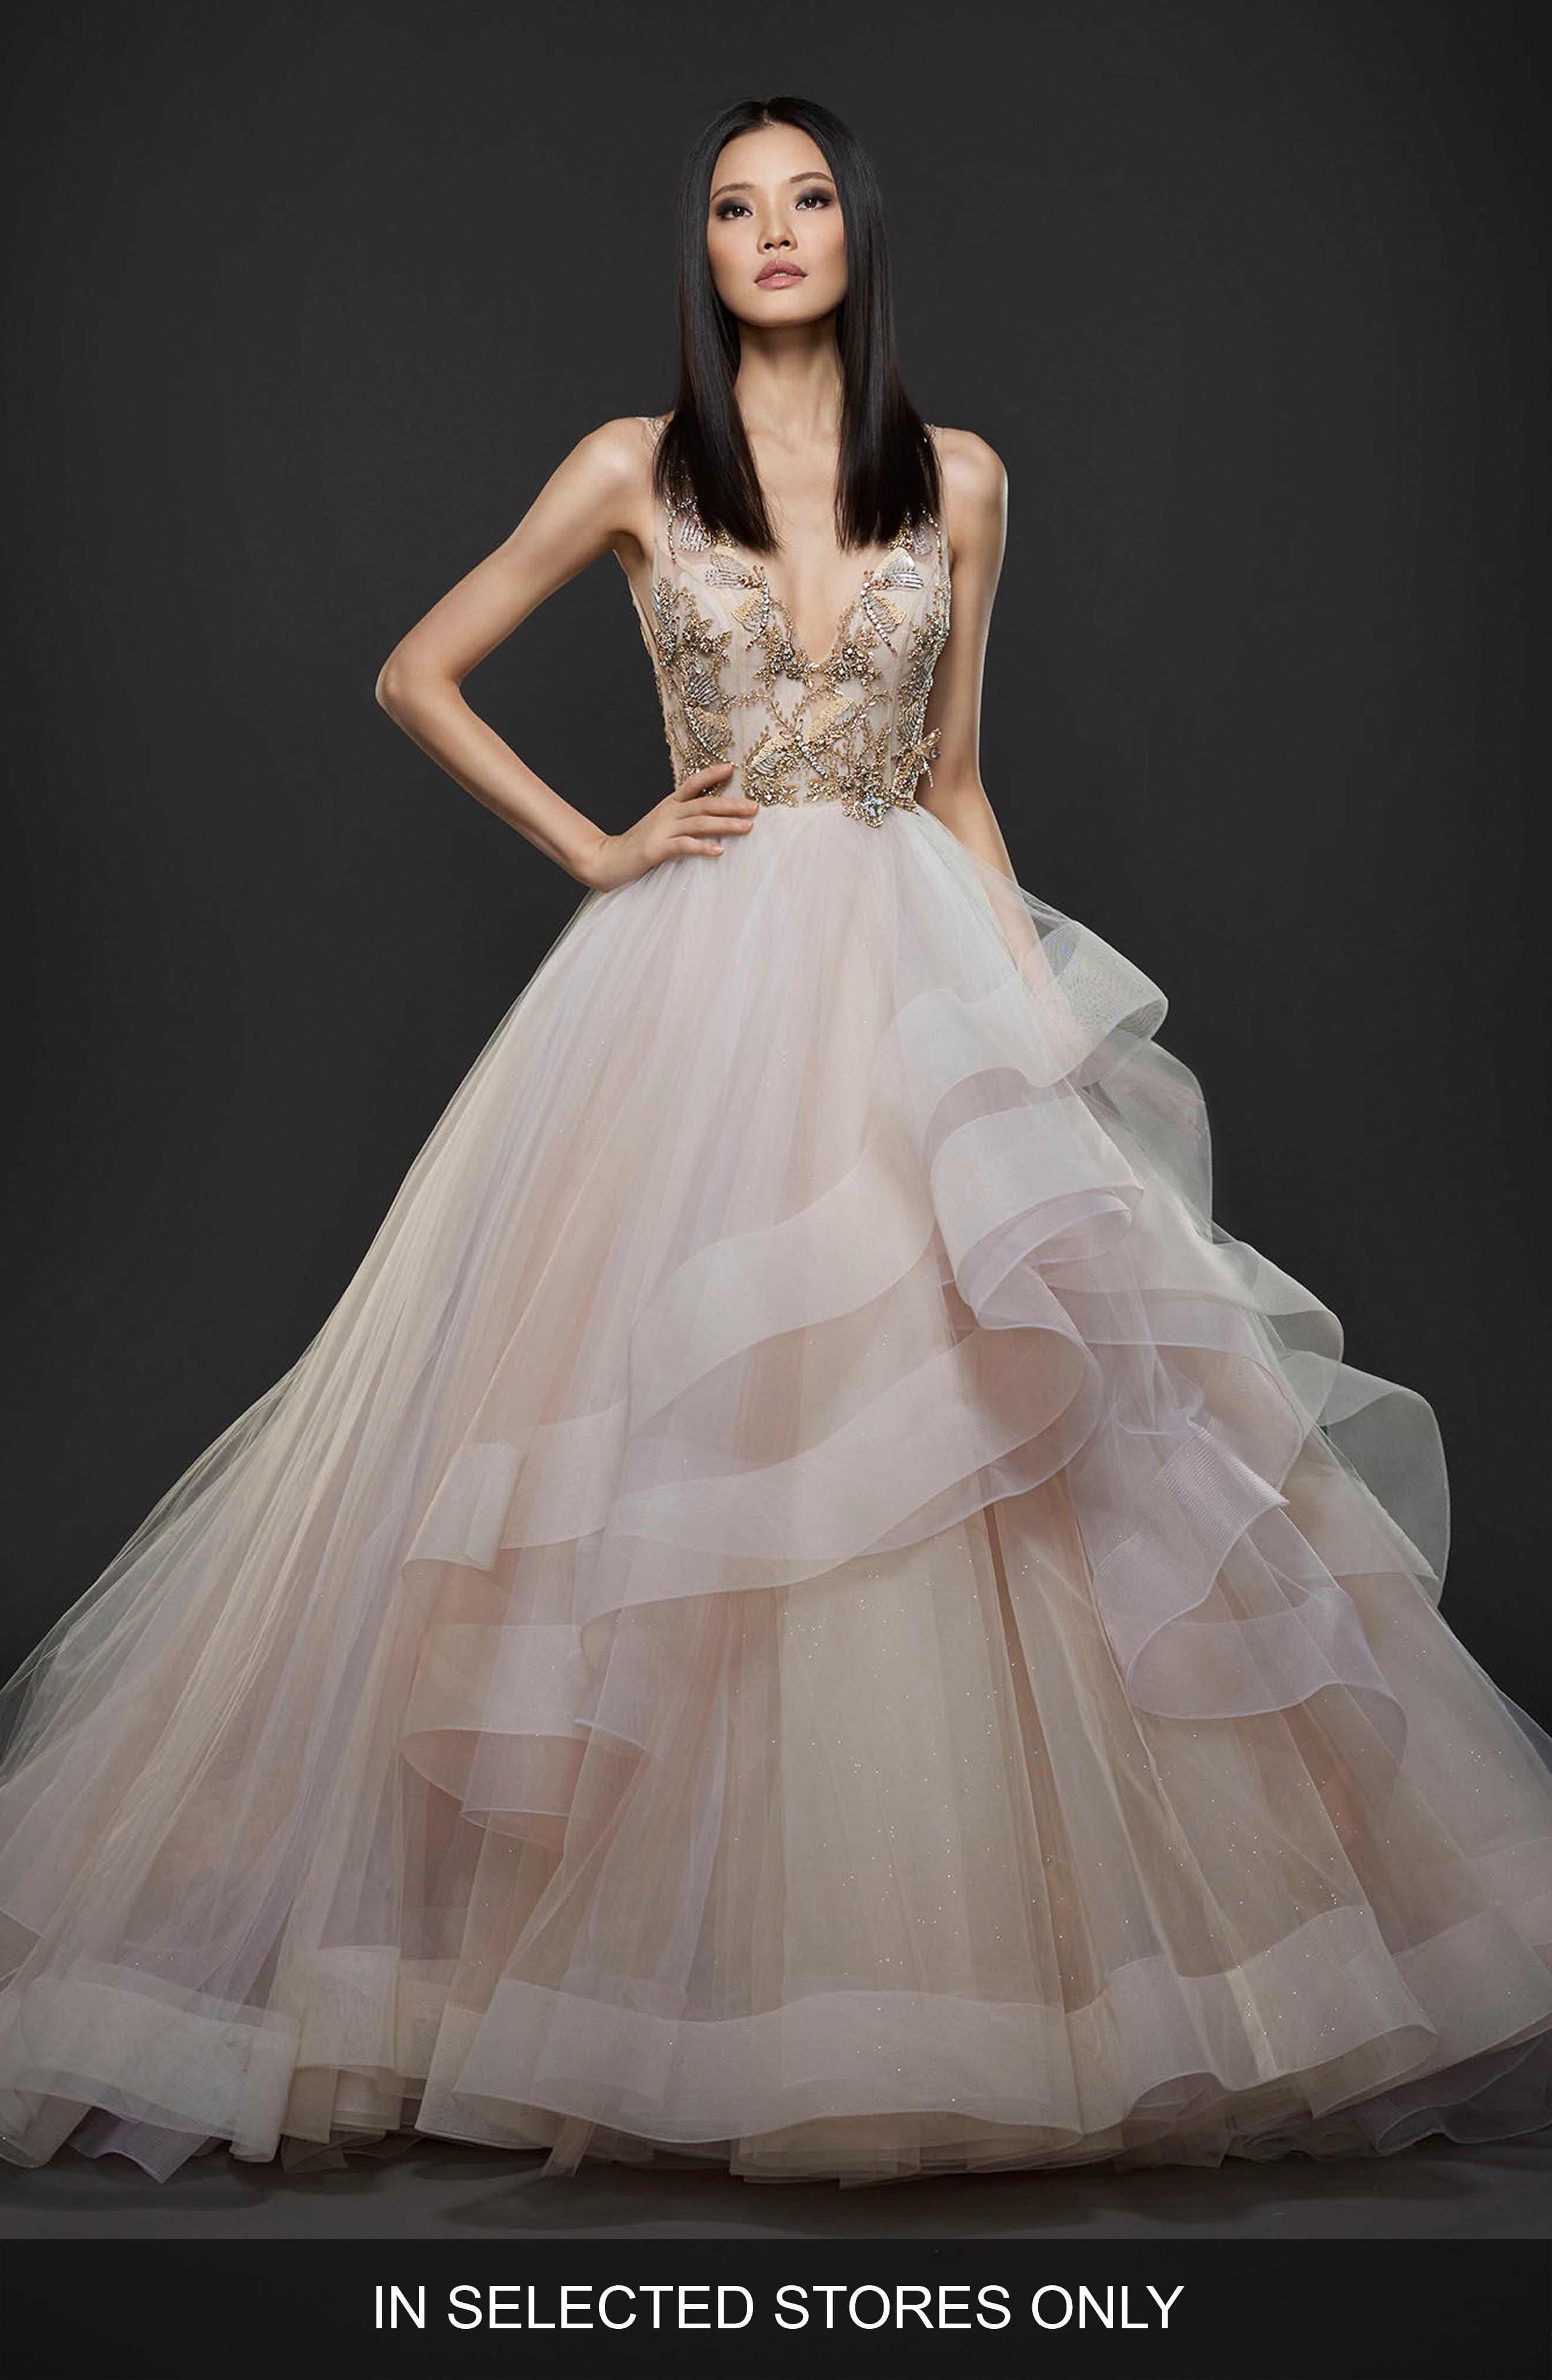 Embellished Layered Organza Ballgown,                             Main thumbnail 1, color,                             Topaz